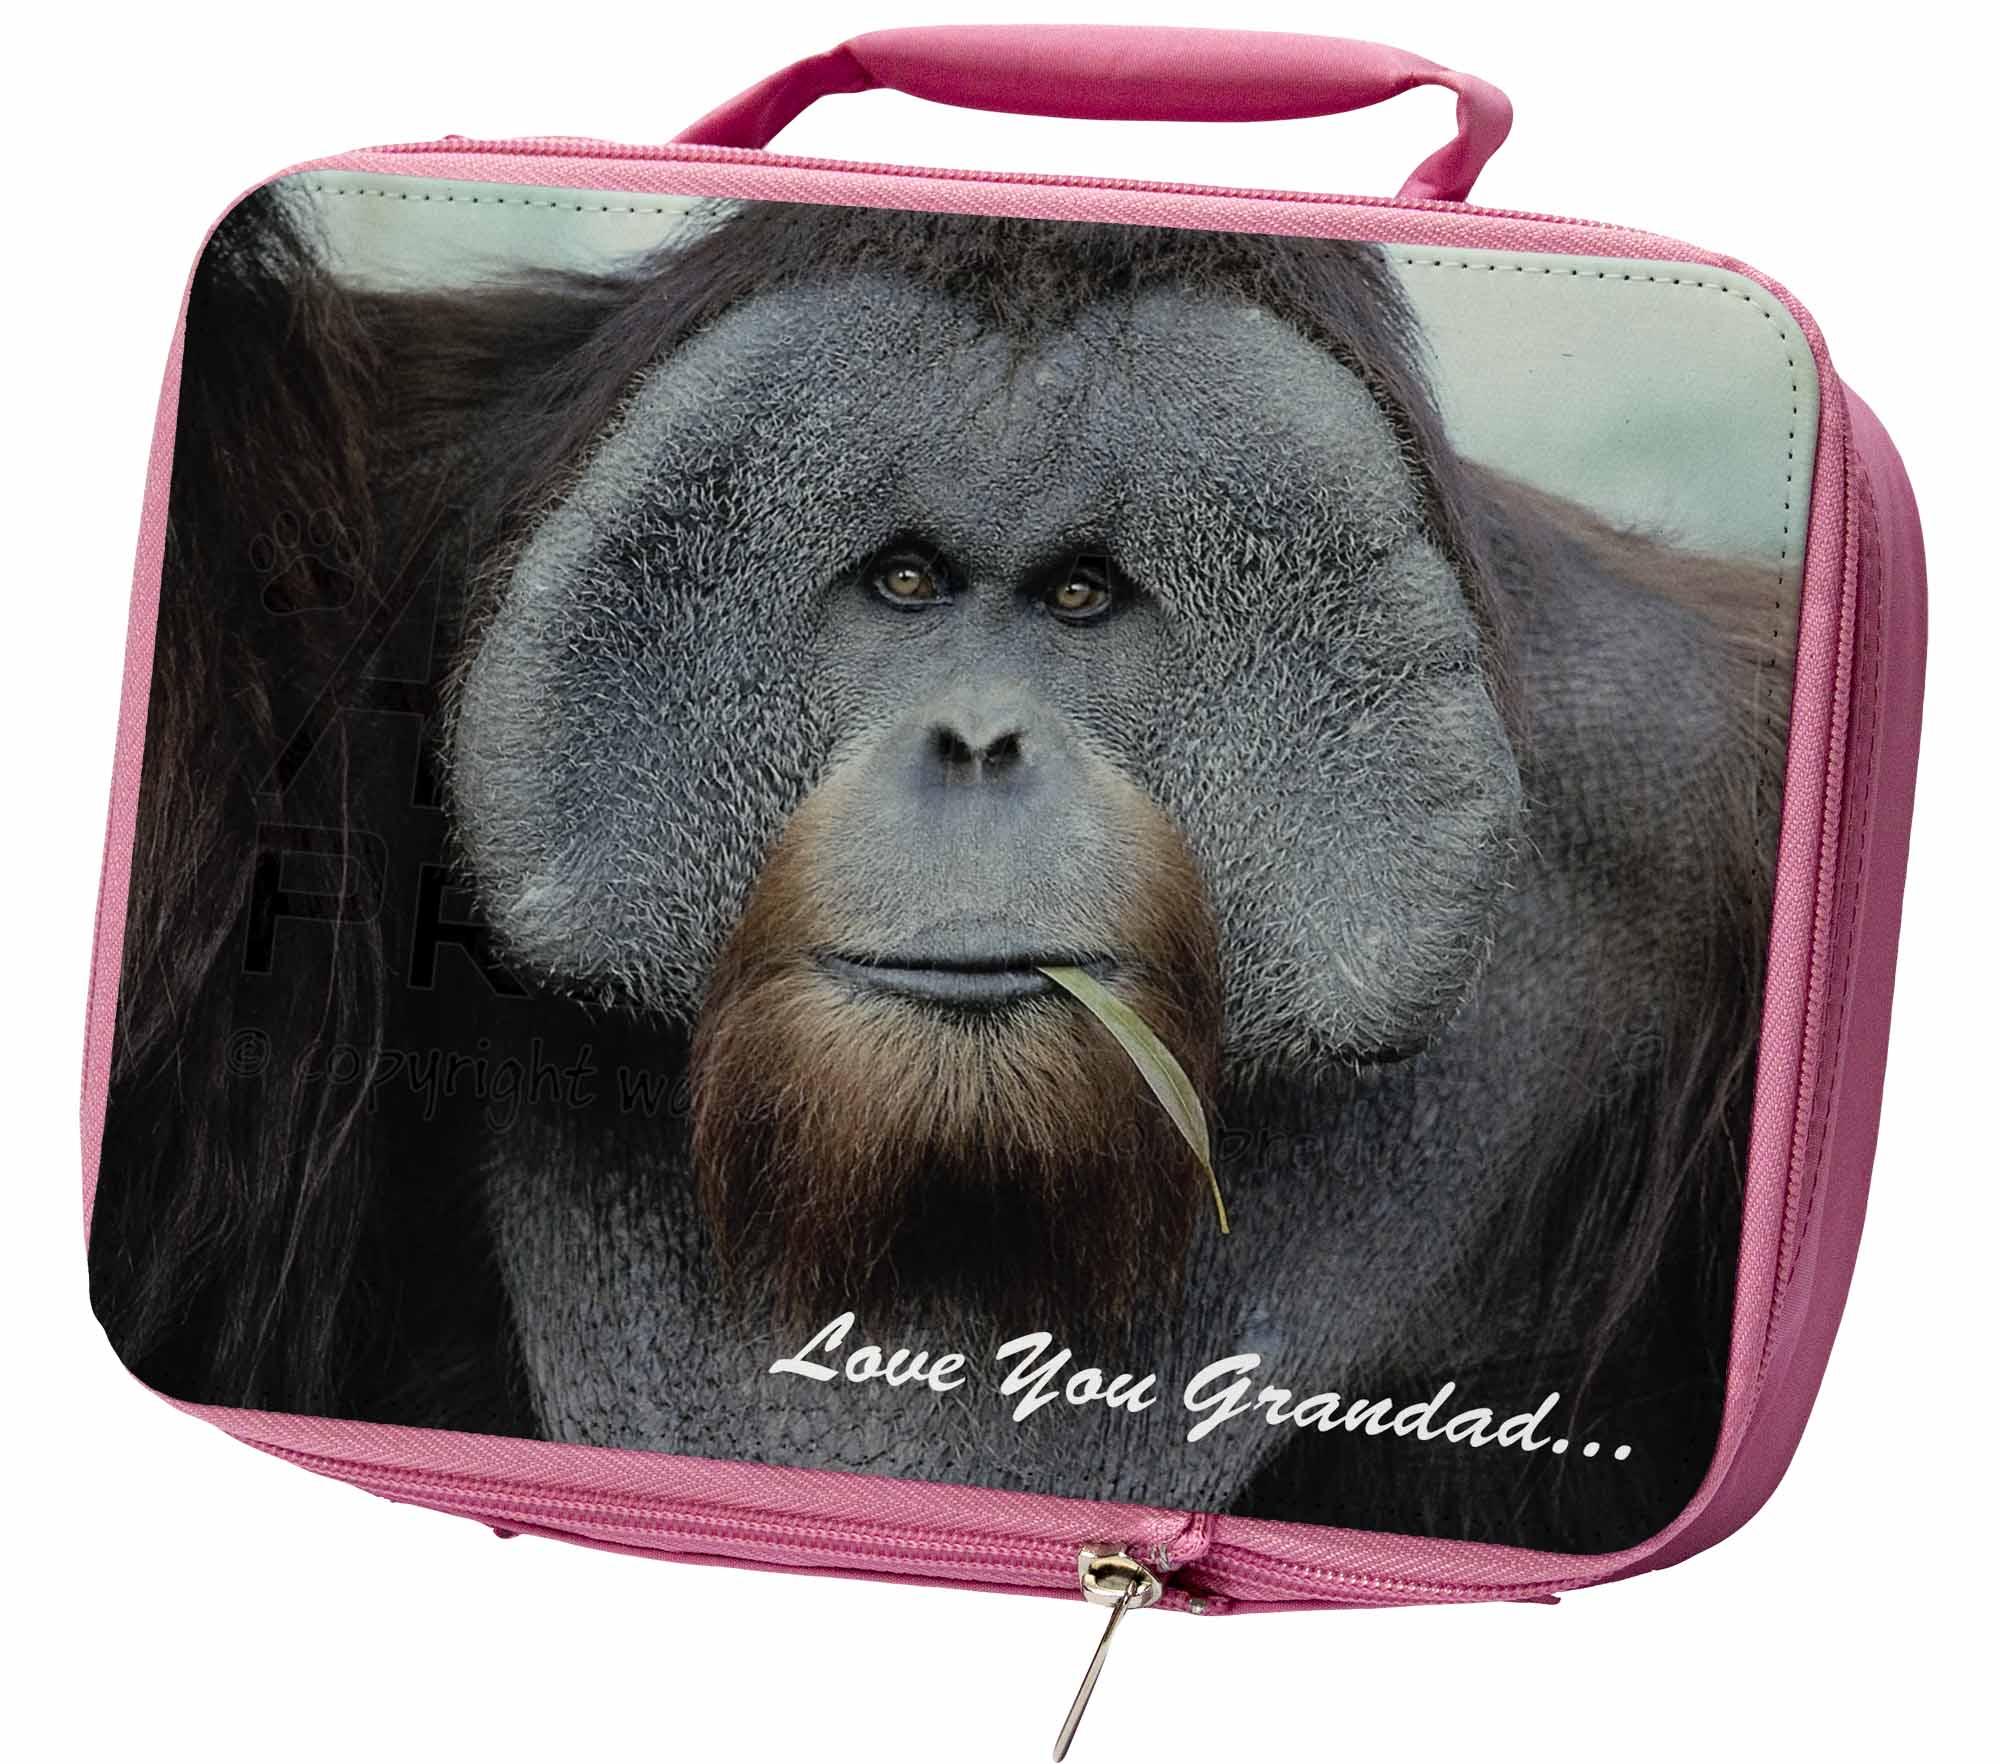 Orangutan-039-Love-You-Abuelo-039-aislante-ROSA-Almuerzo-Escolar-Caja-Bolsa-am-2lgdlbp